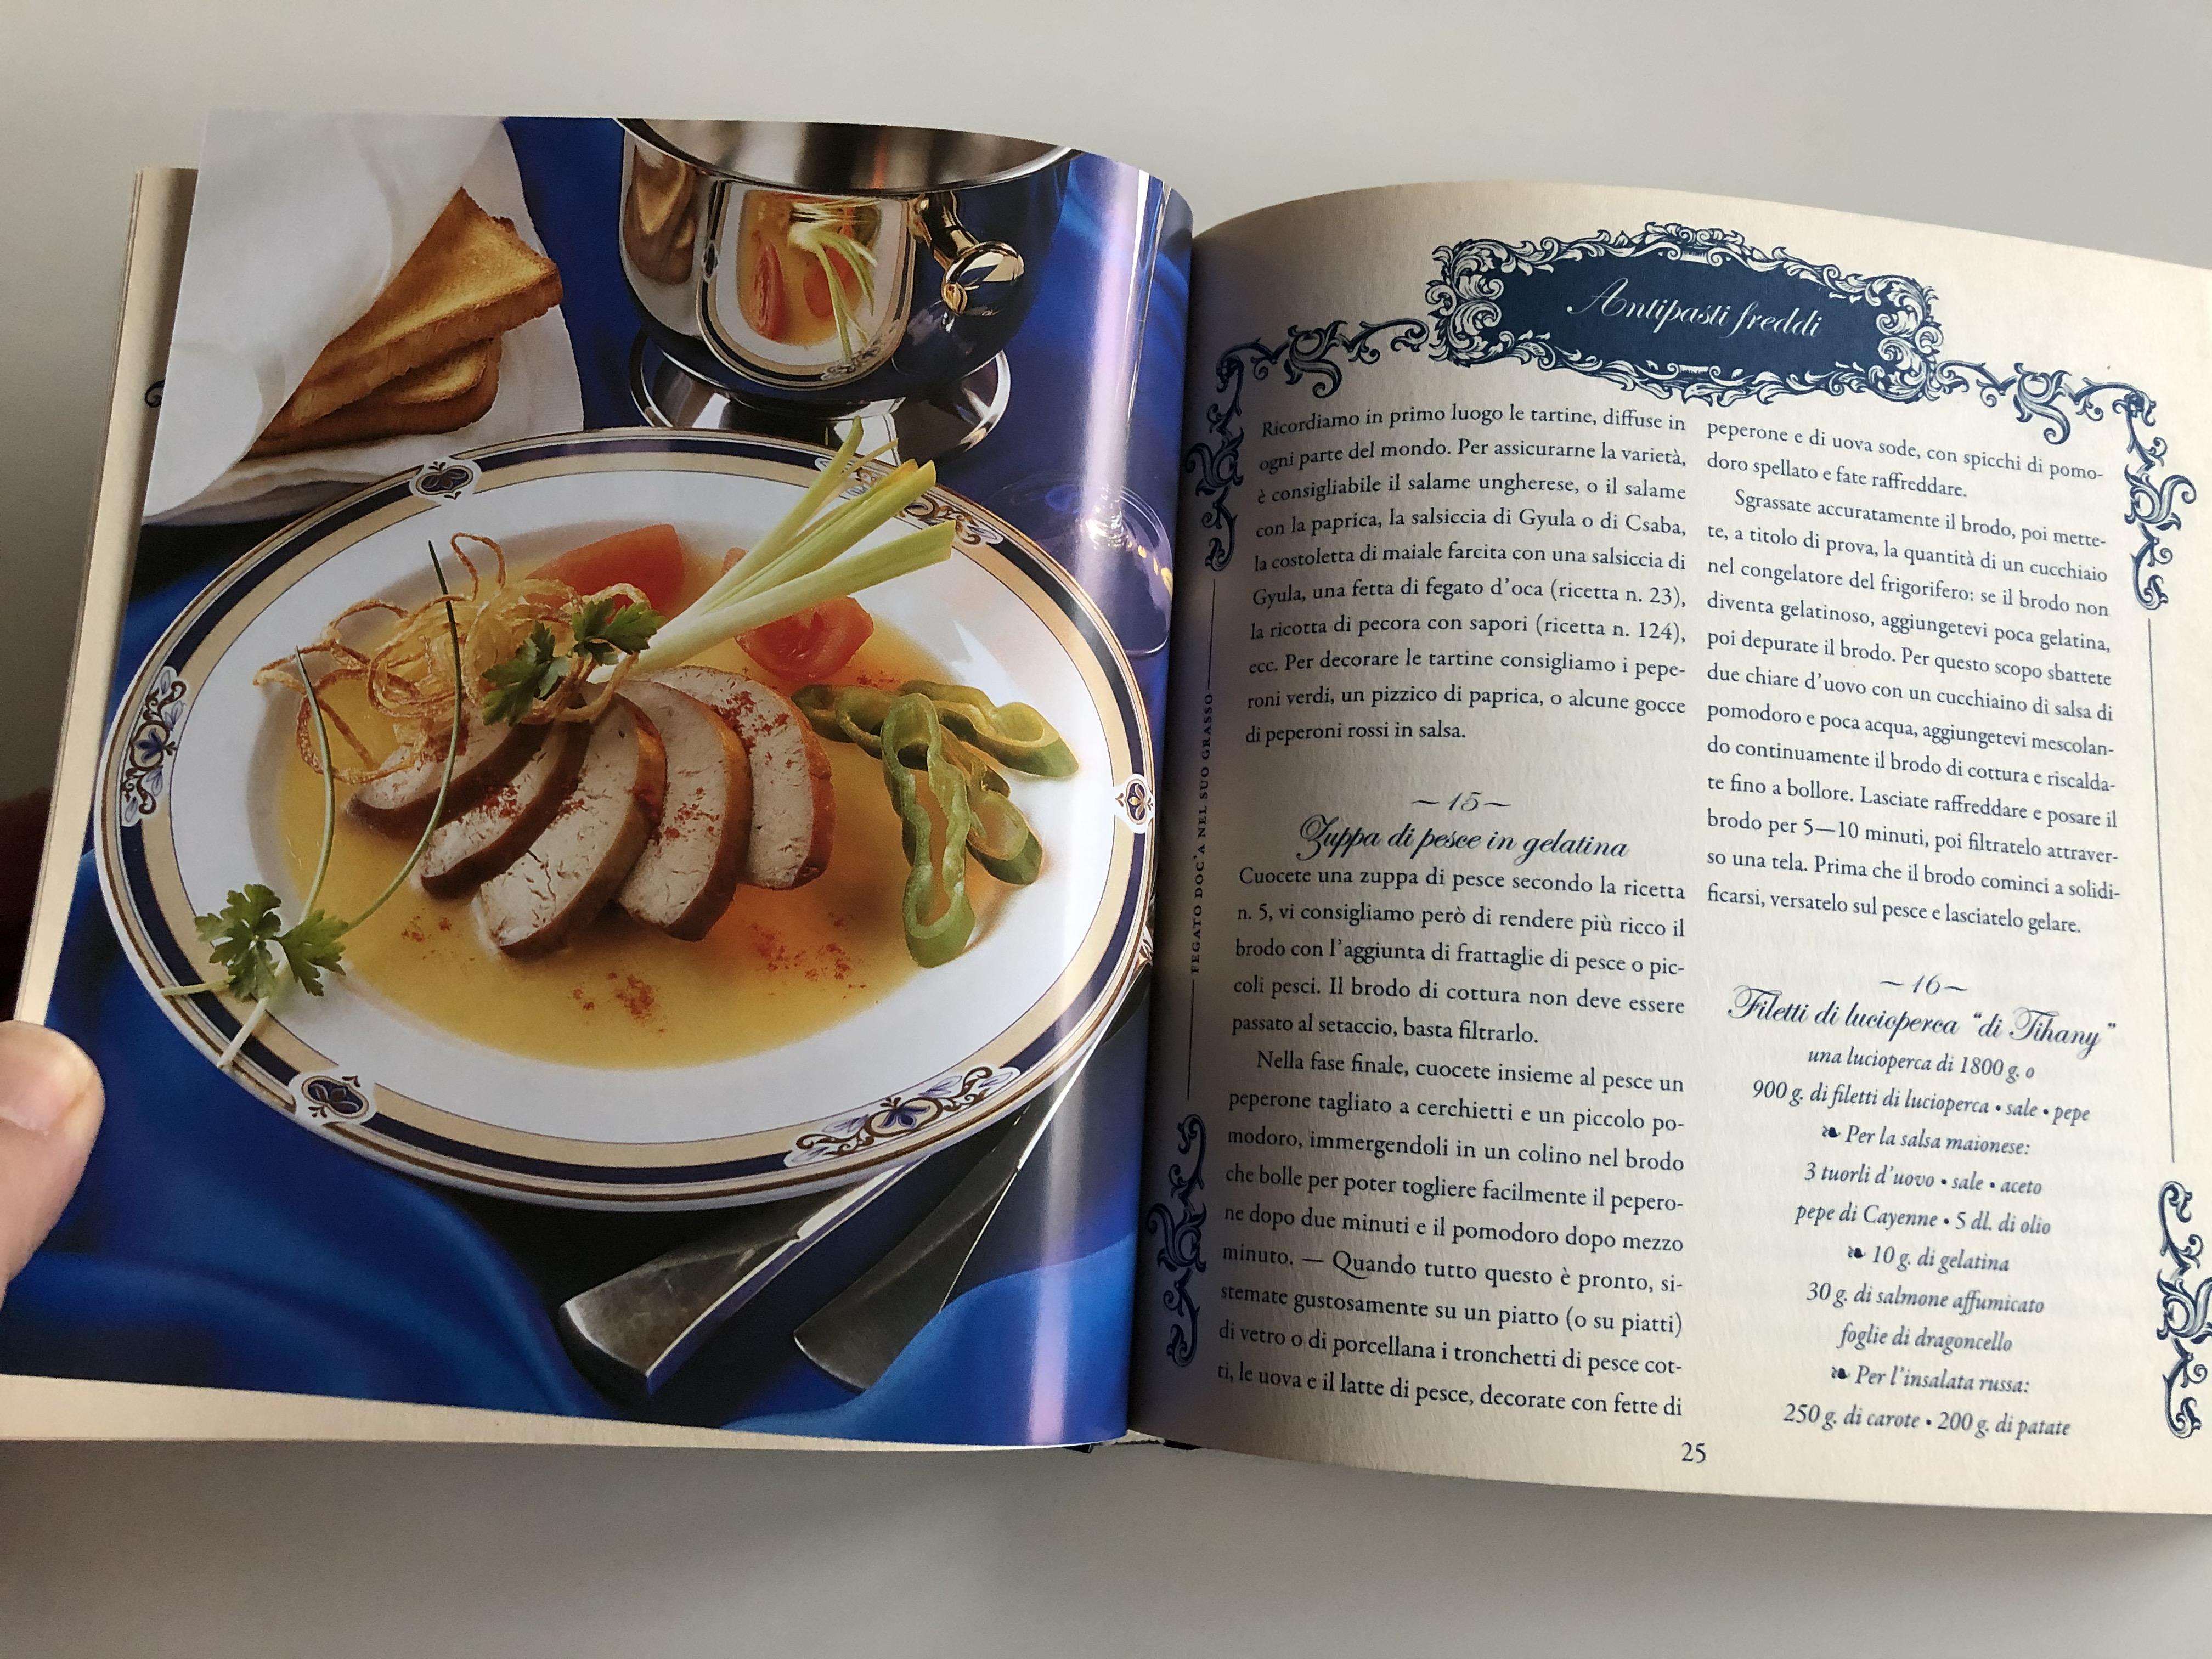 la-cucina-ungherese-by-k-roly-gundel-rielaborat-dai-figli-ferenc-gundel-imre-gundel-corvina-7.jpg